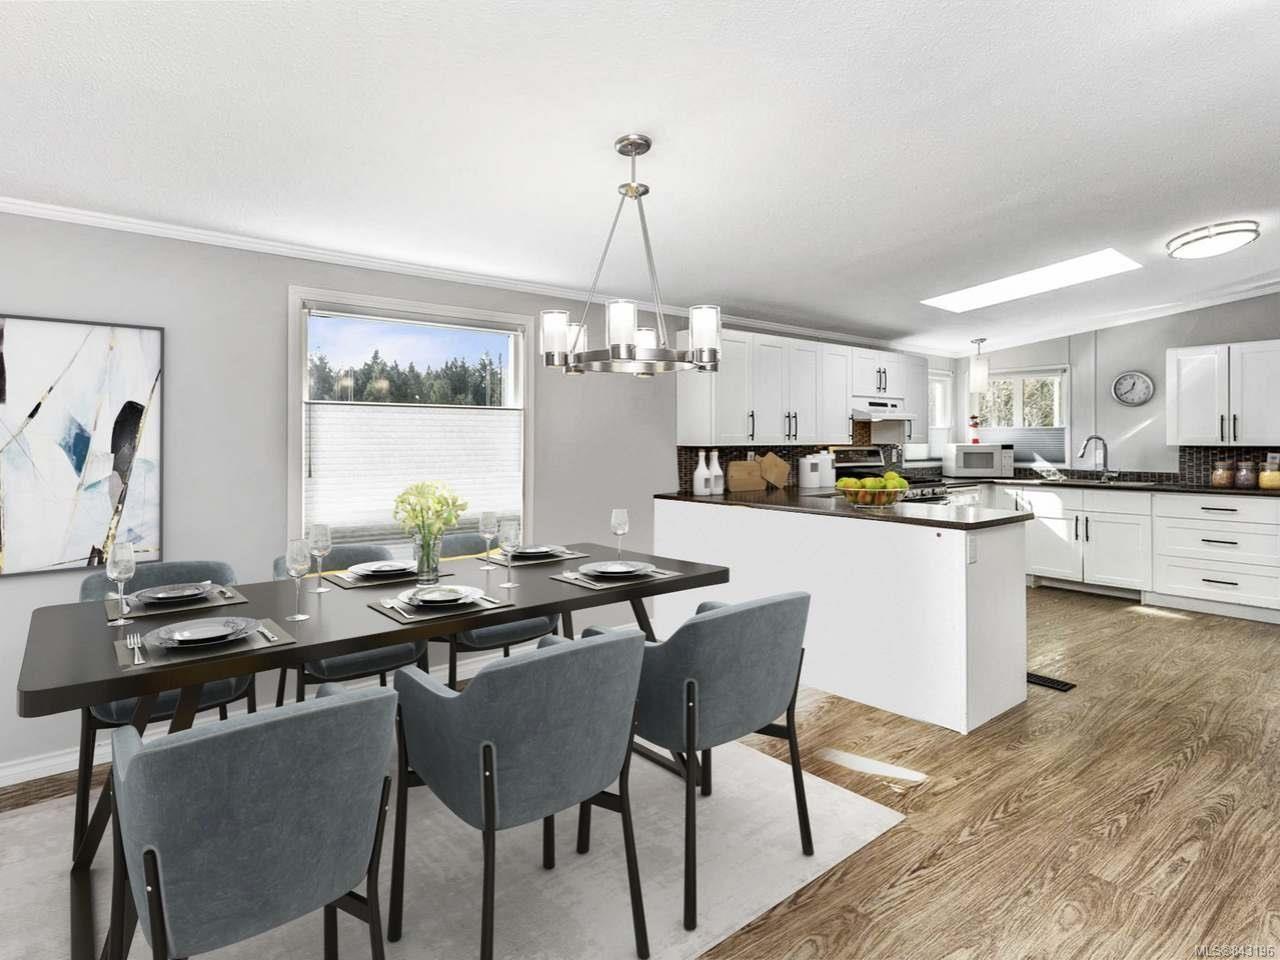 Main Photo: 1177 Morrell Cir in NANAIMO: Na South Nanaimo Manufactured Home for sale (Nanaimo)  : MLS®# 843196